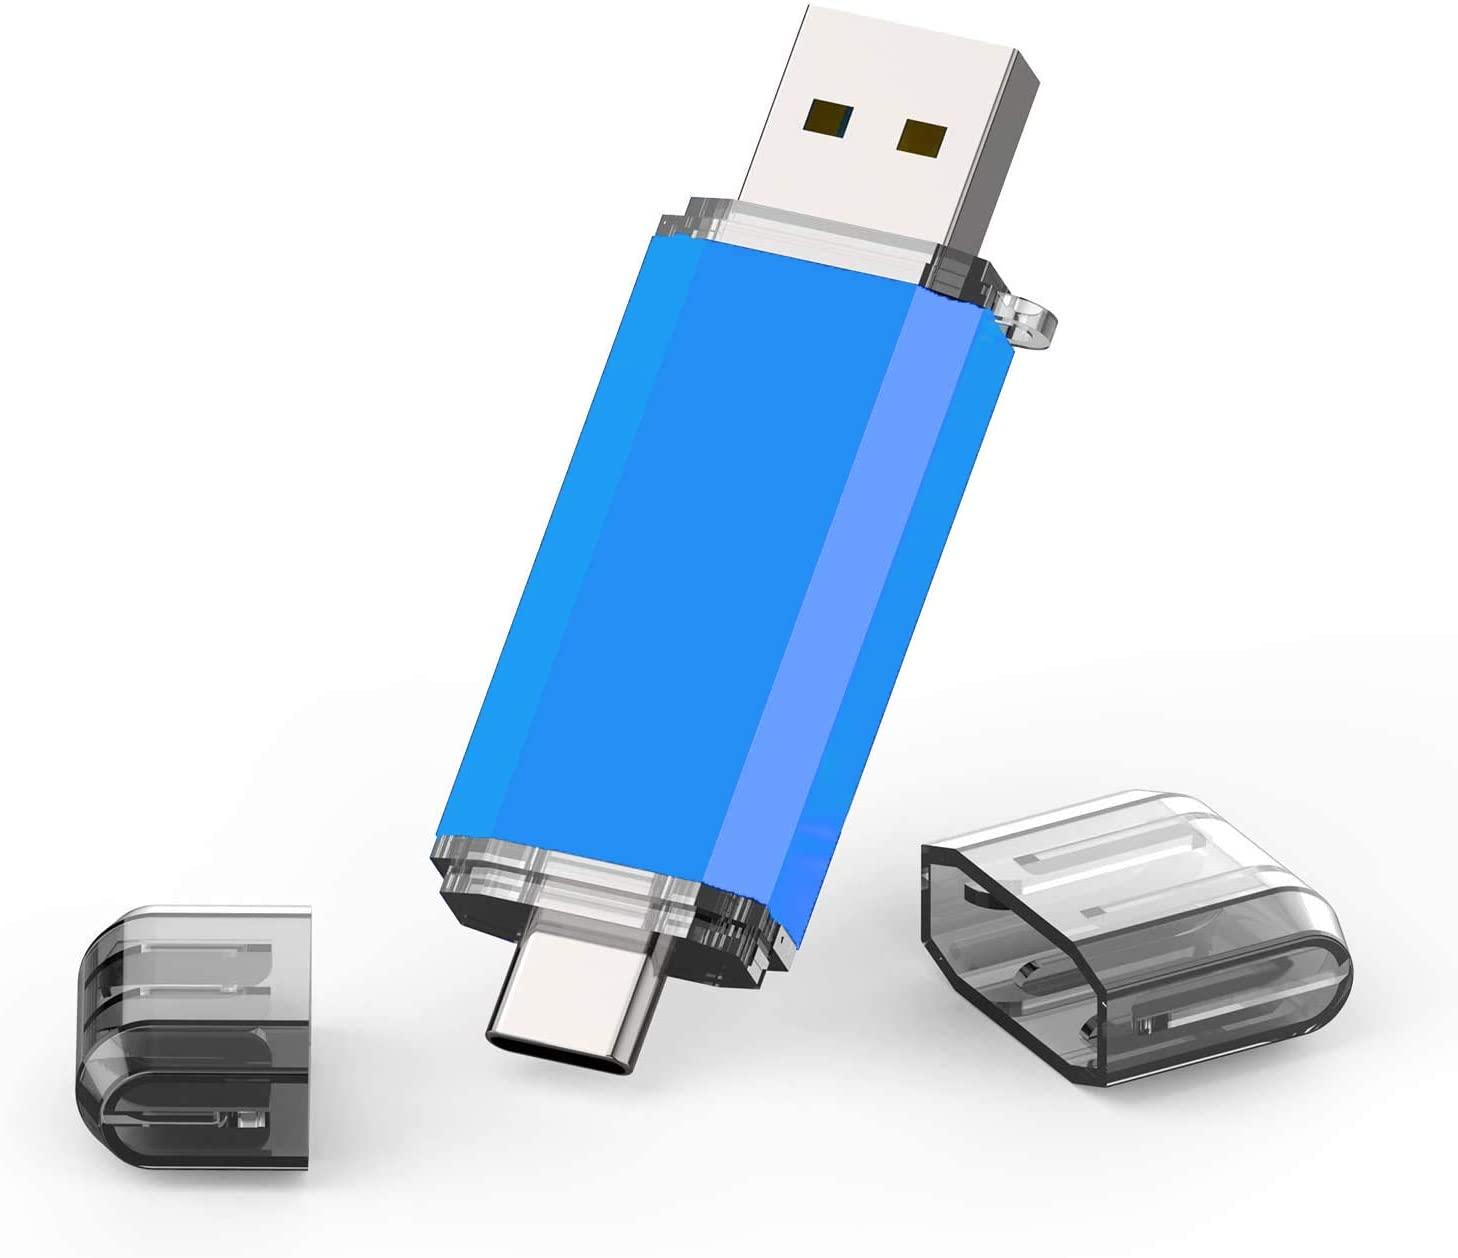 TOPESEL USB 3.0 Type C Dual OTG Flash Drive USB C Thumb Drive Memory Stick for USB-C Smartphones,Tablets & New MacBook